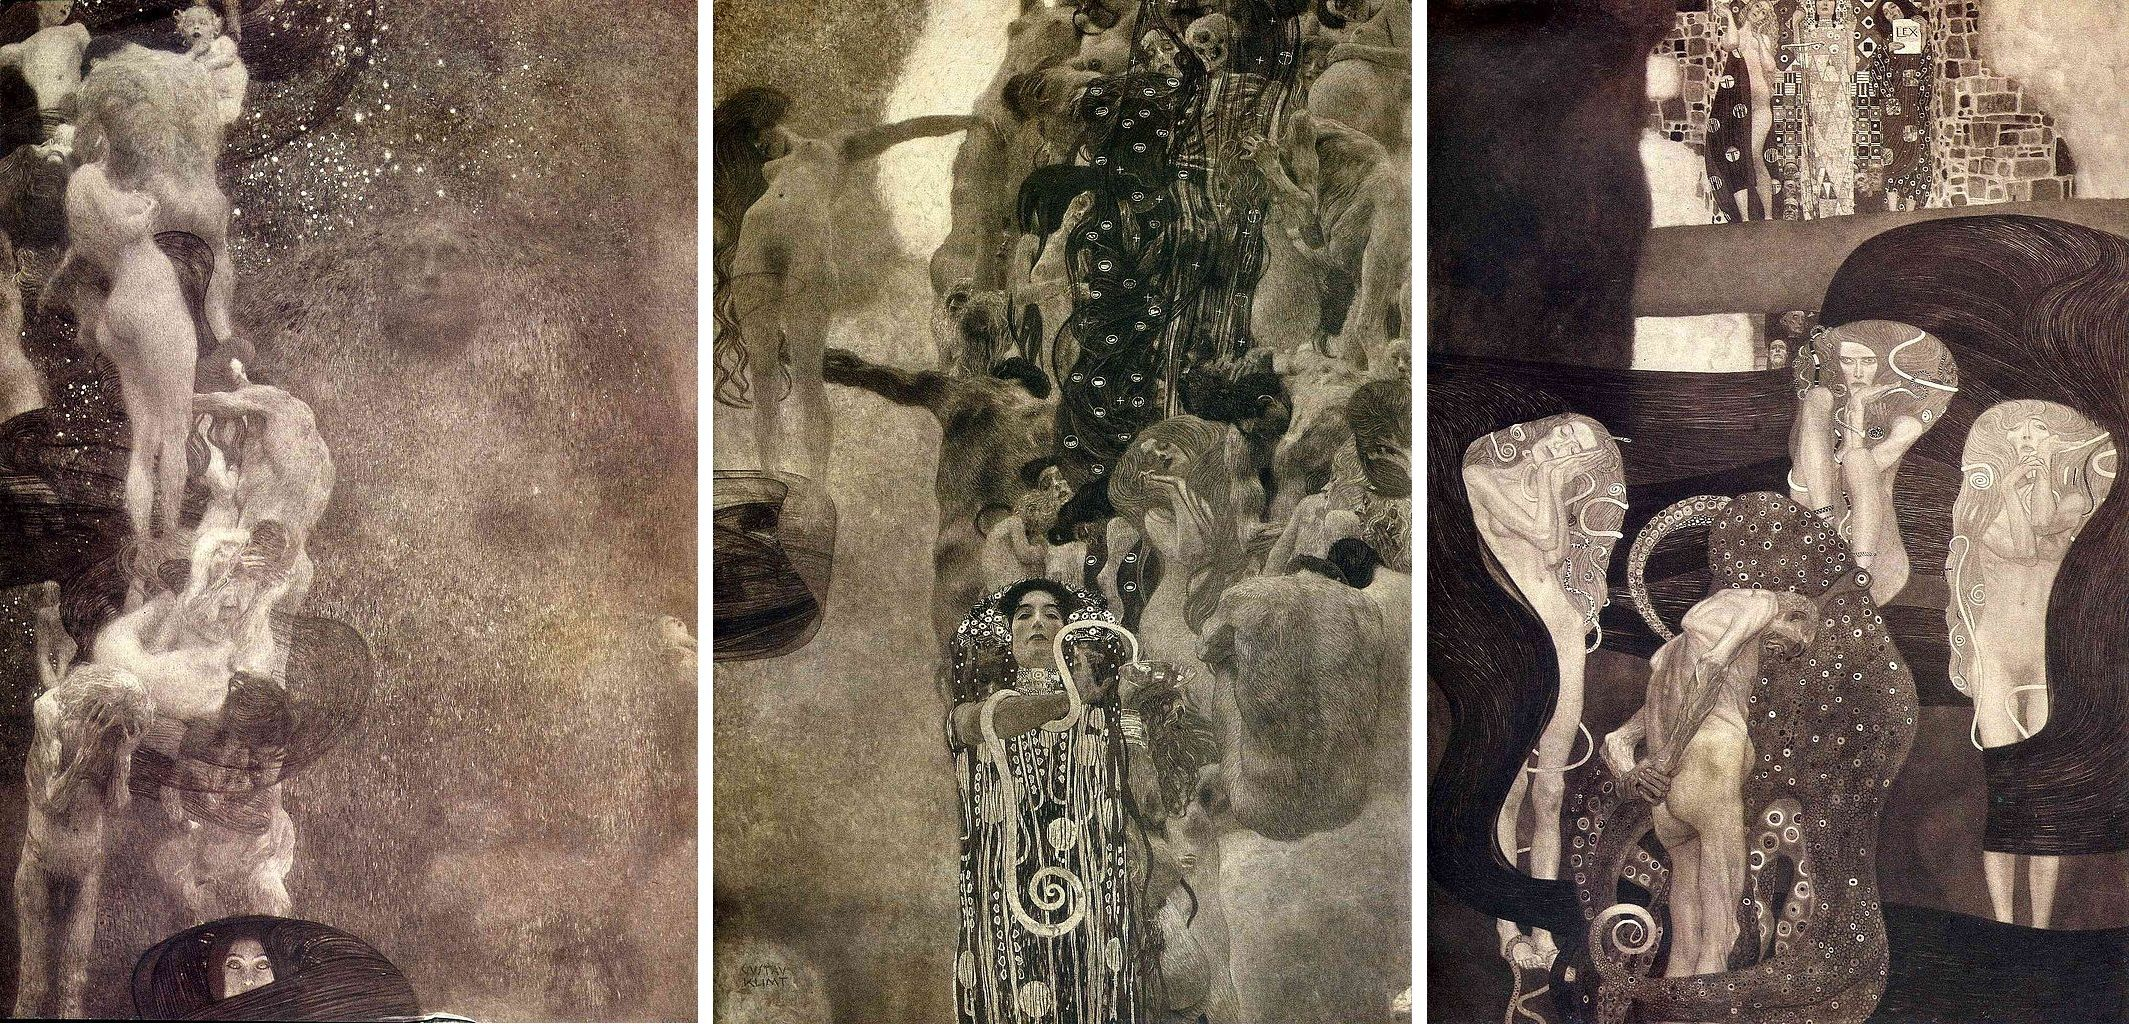 Philosophy Medicine Amp Jurisprudence Gustav Klimt 1907 University Of Vienna Ceiling